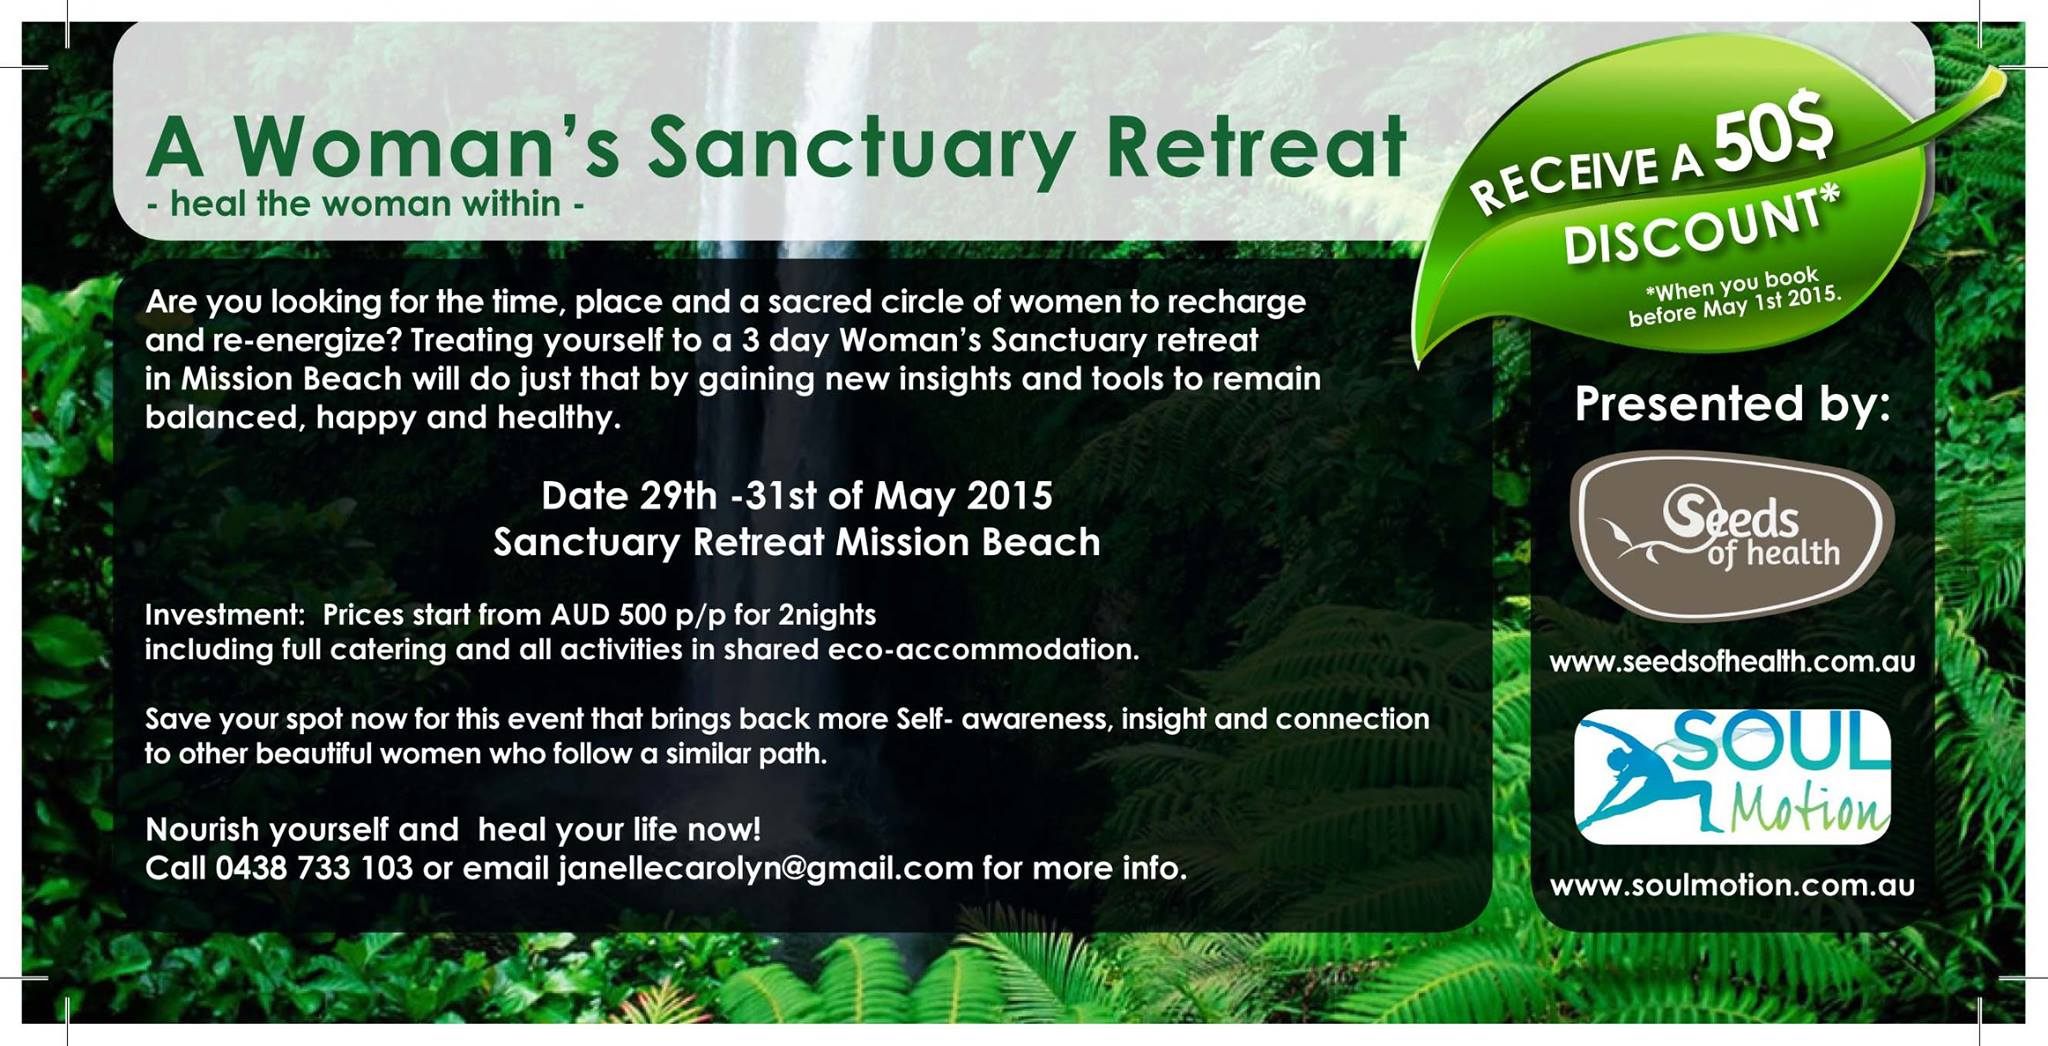 3 day women's retreat in Mission Beach, North Queensland